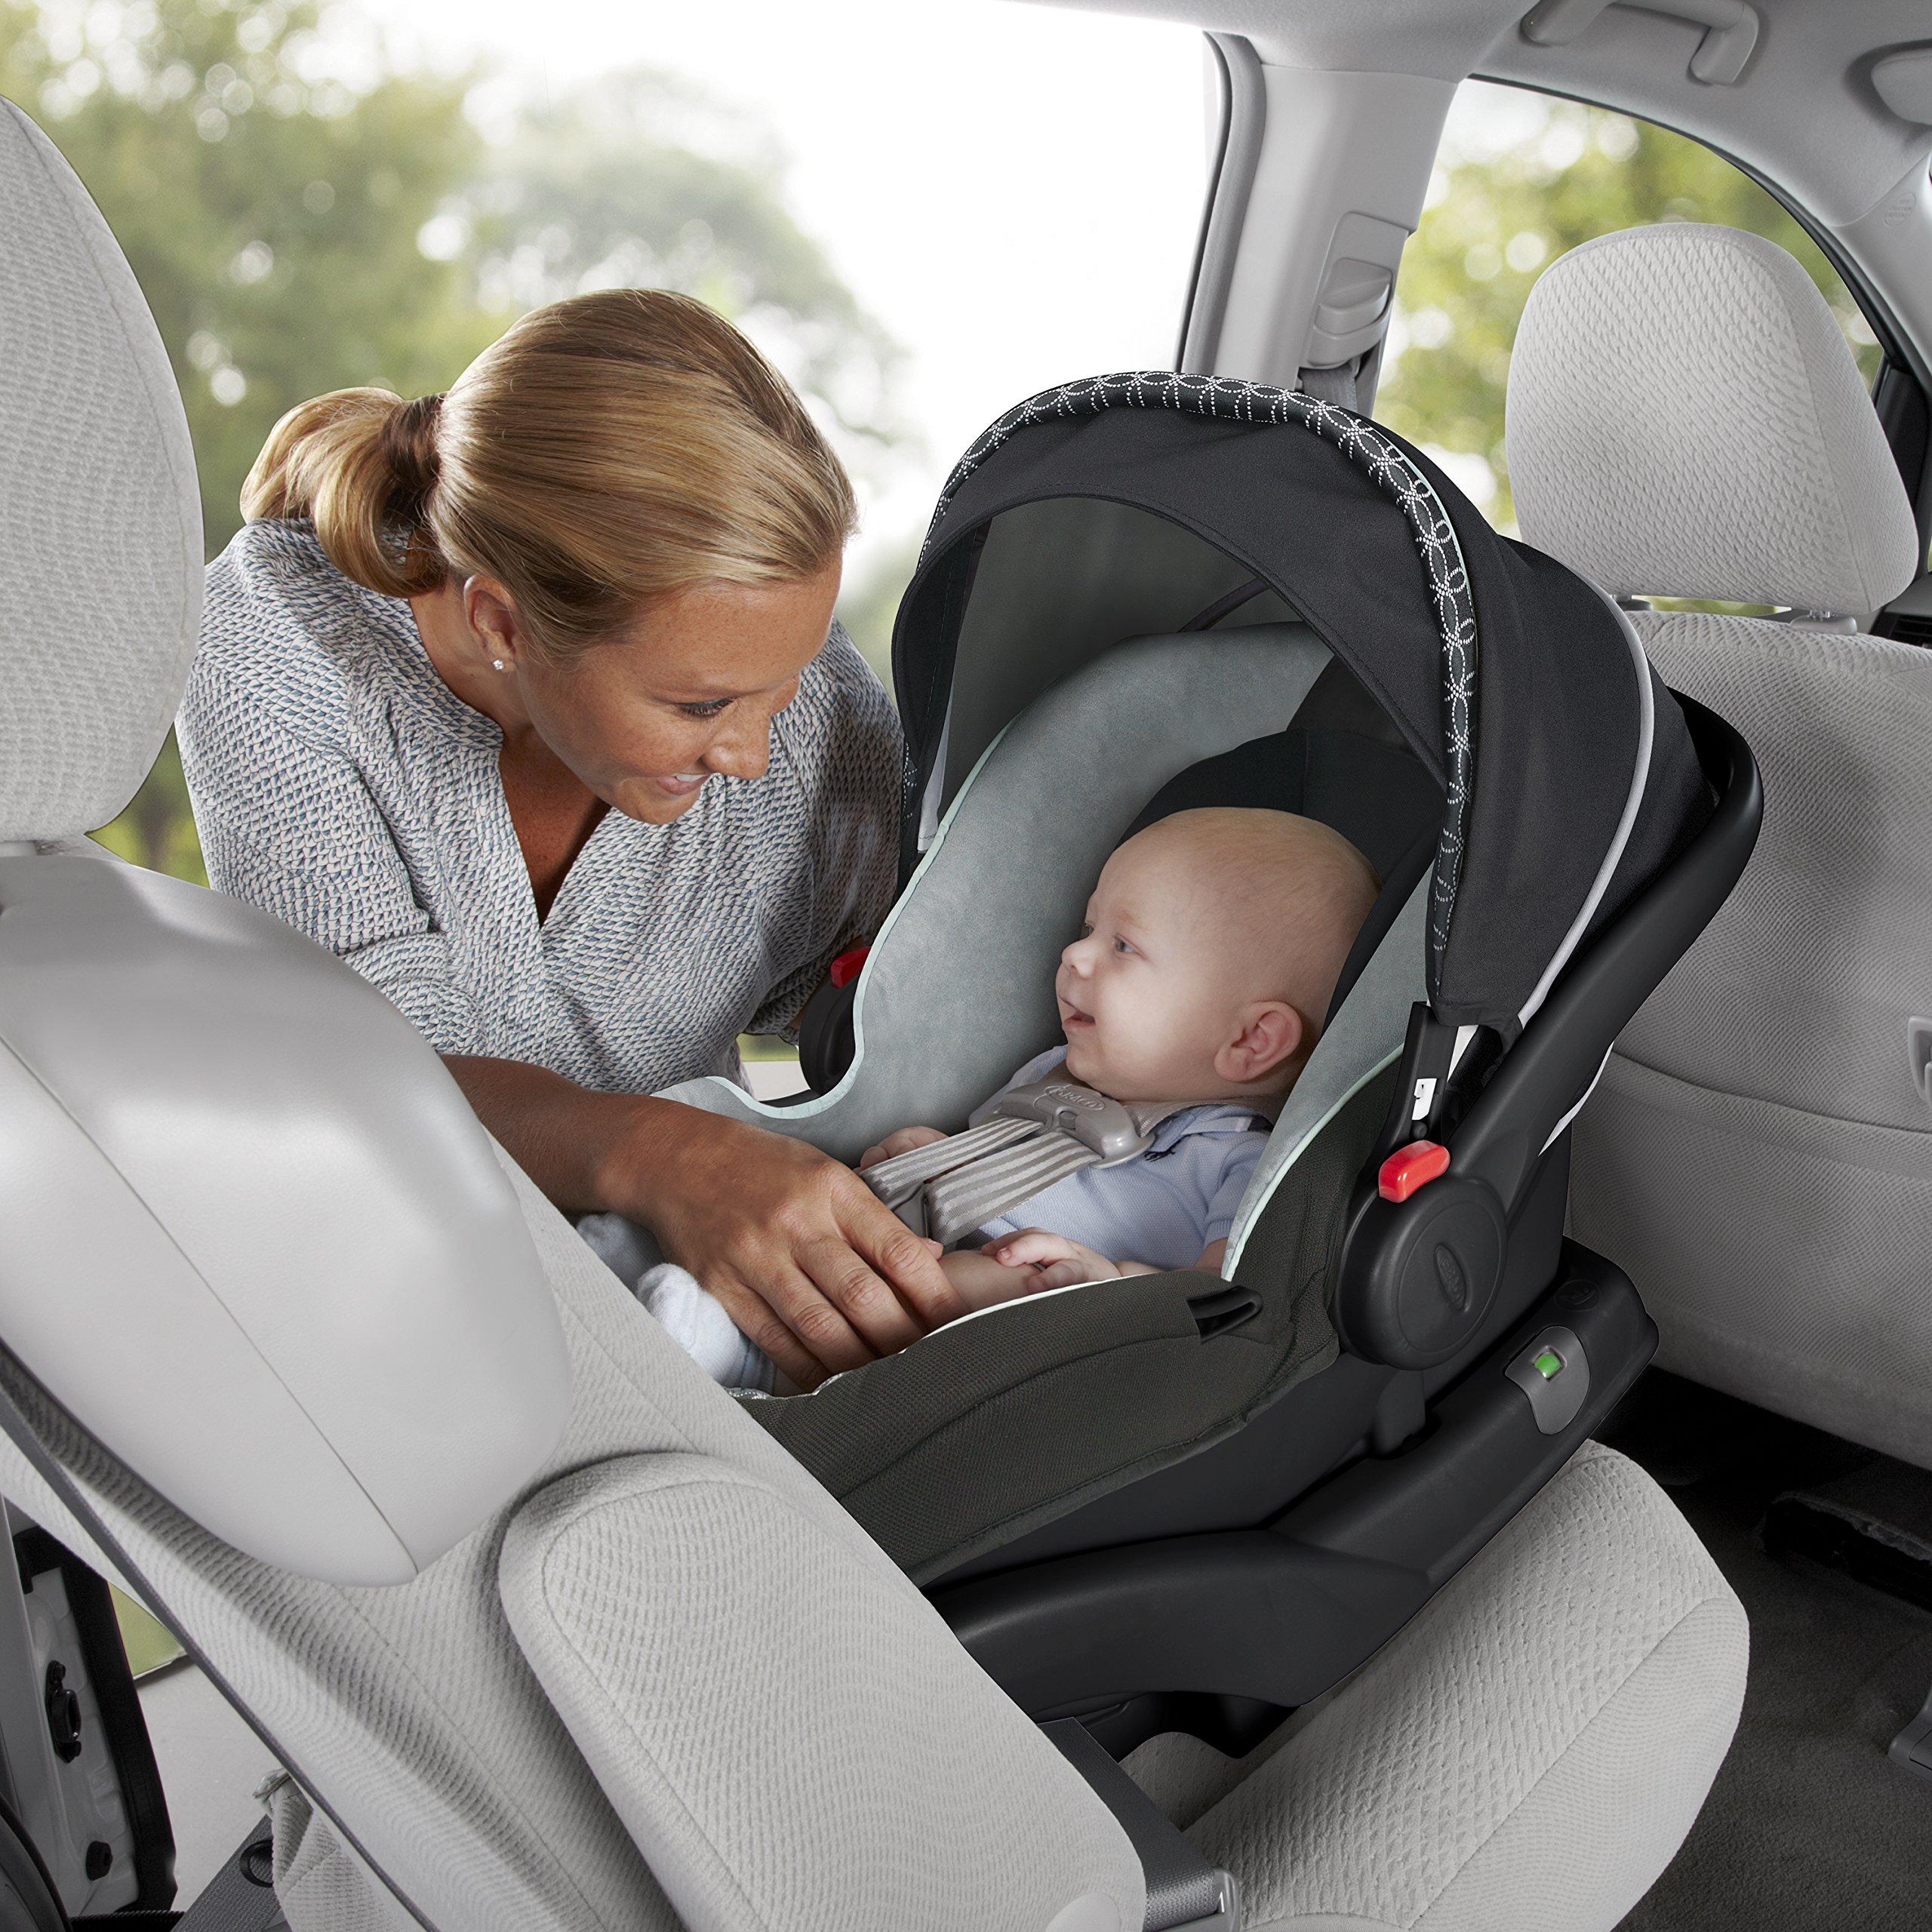 graco snugride click connect 30 35 lx infant car seat base black one size amazon. Black Bedroom Furniture Sets. Home Design Ideas